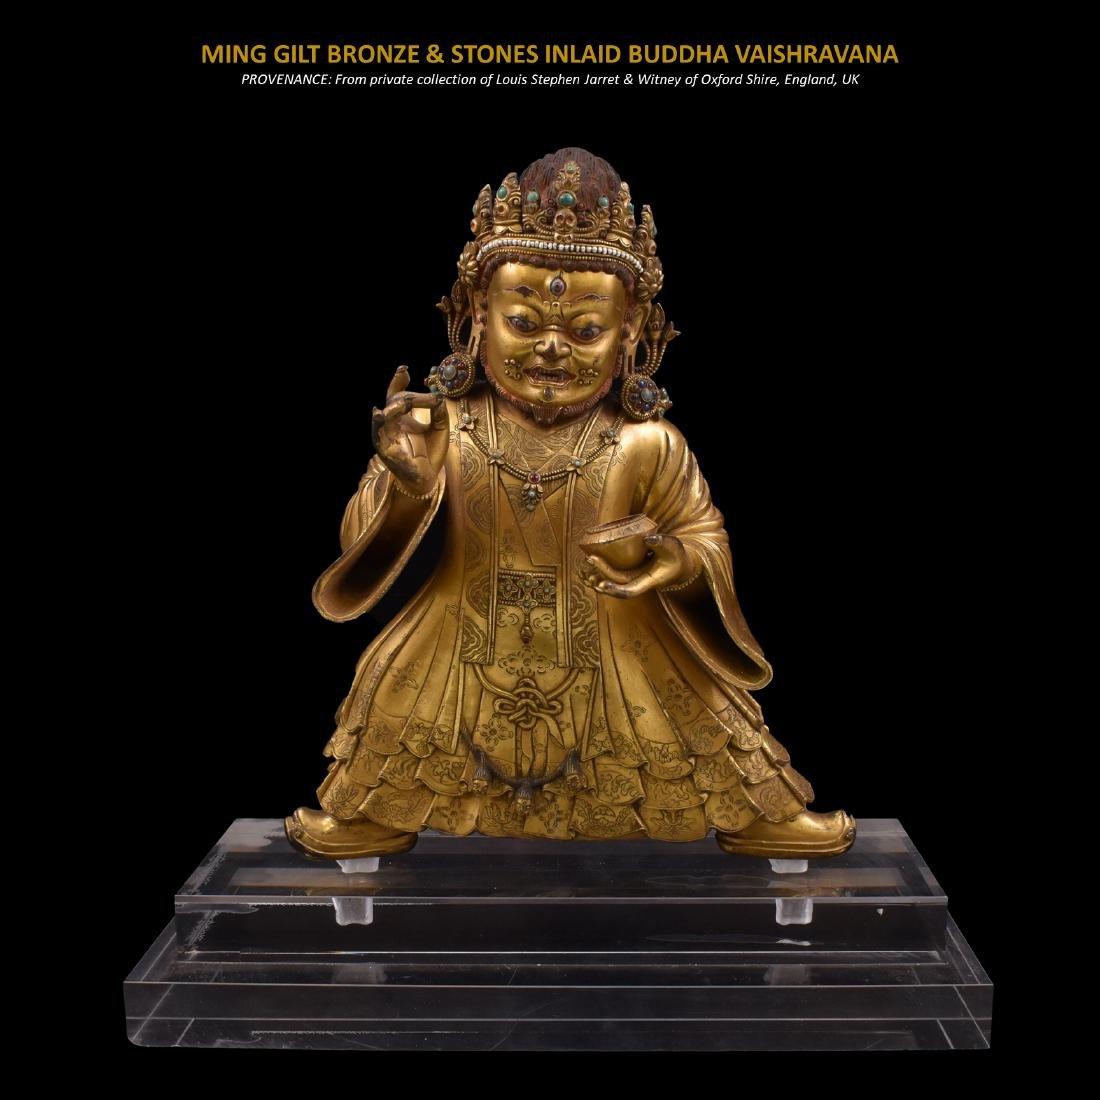 MING GILT BRONZE & STONES INLAID BUDDHA VAISHRAVANA